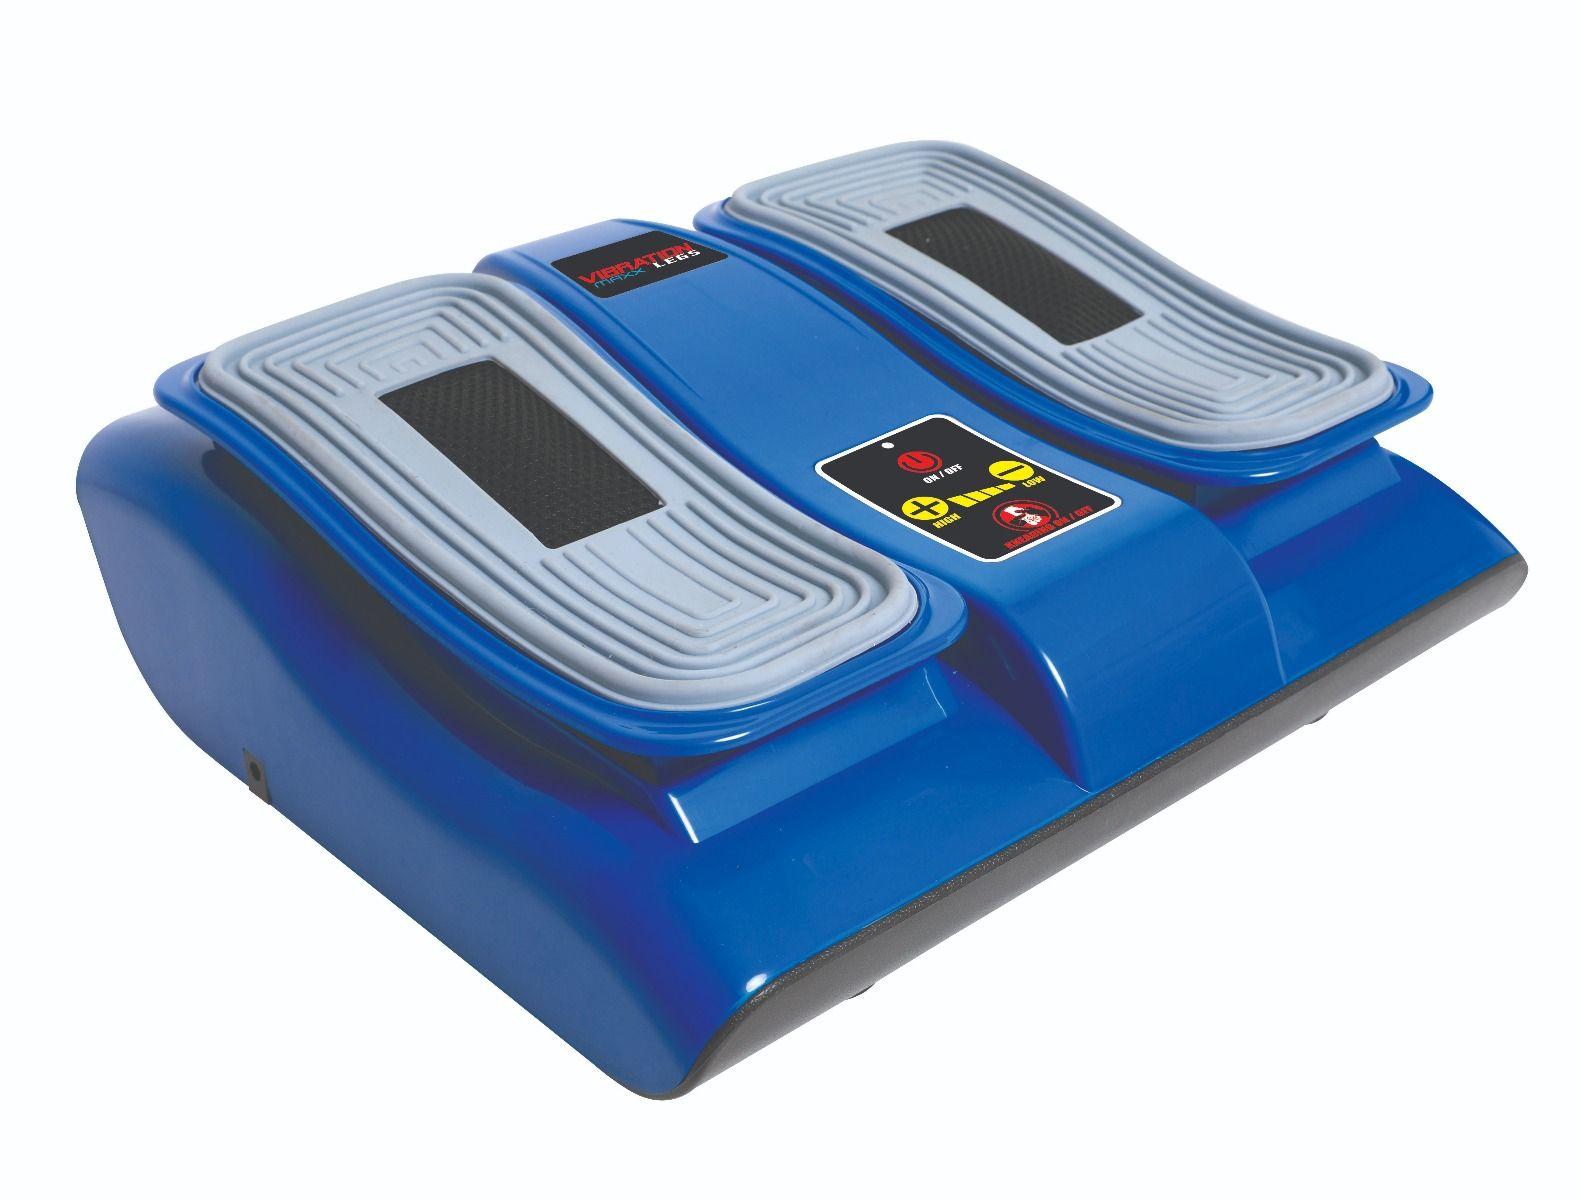 Vibration Maxx retro leg massager and circulation booster